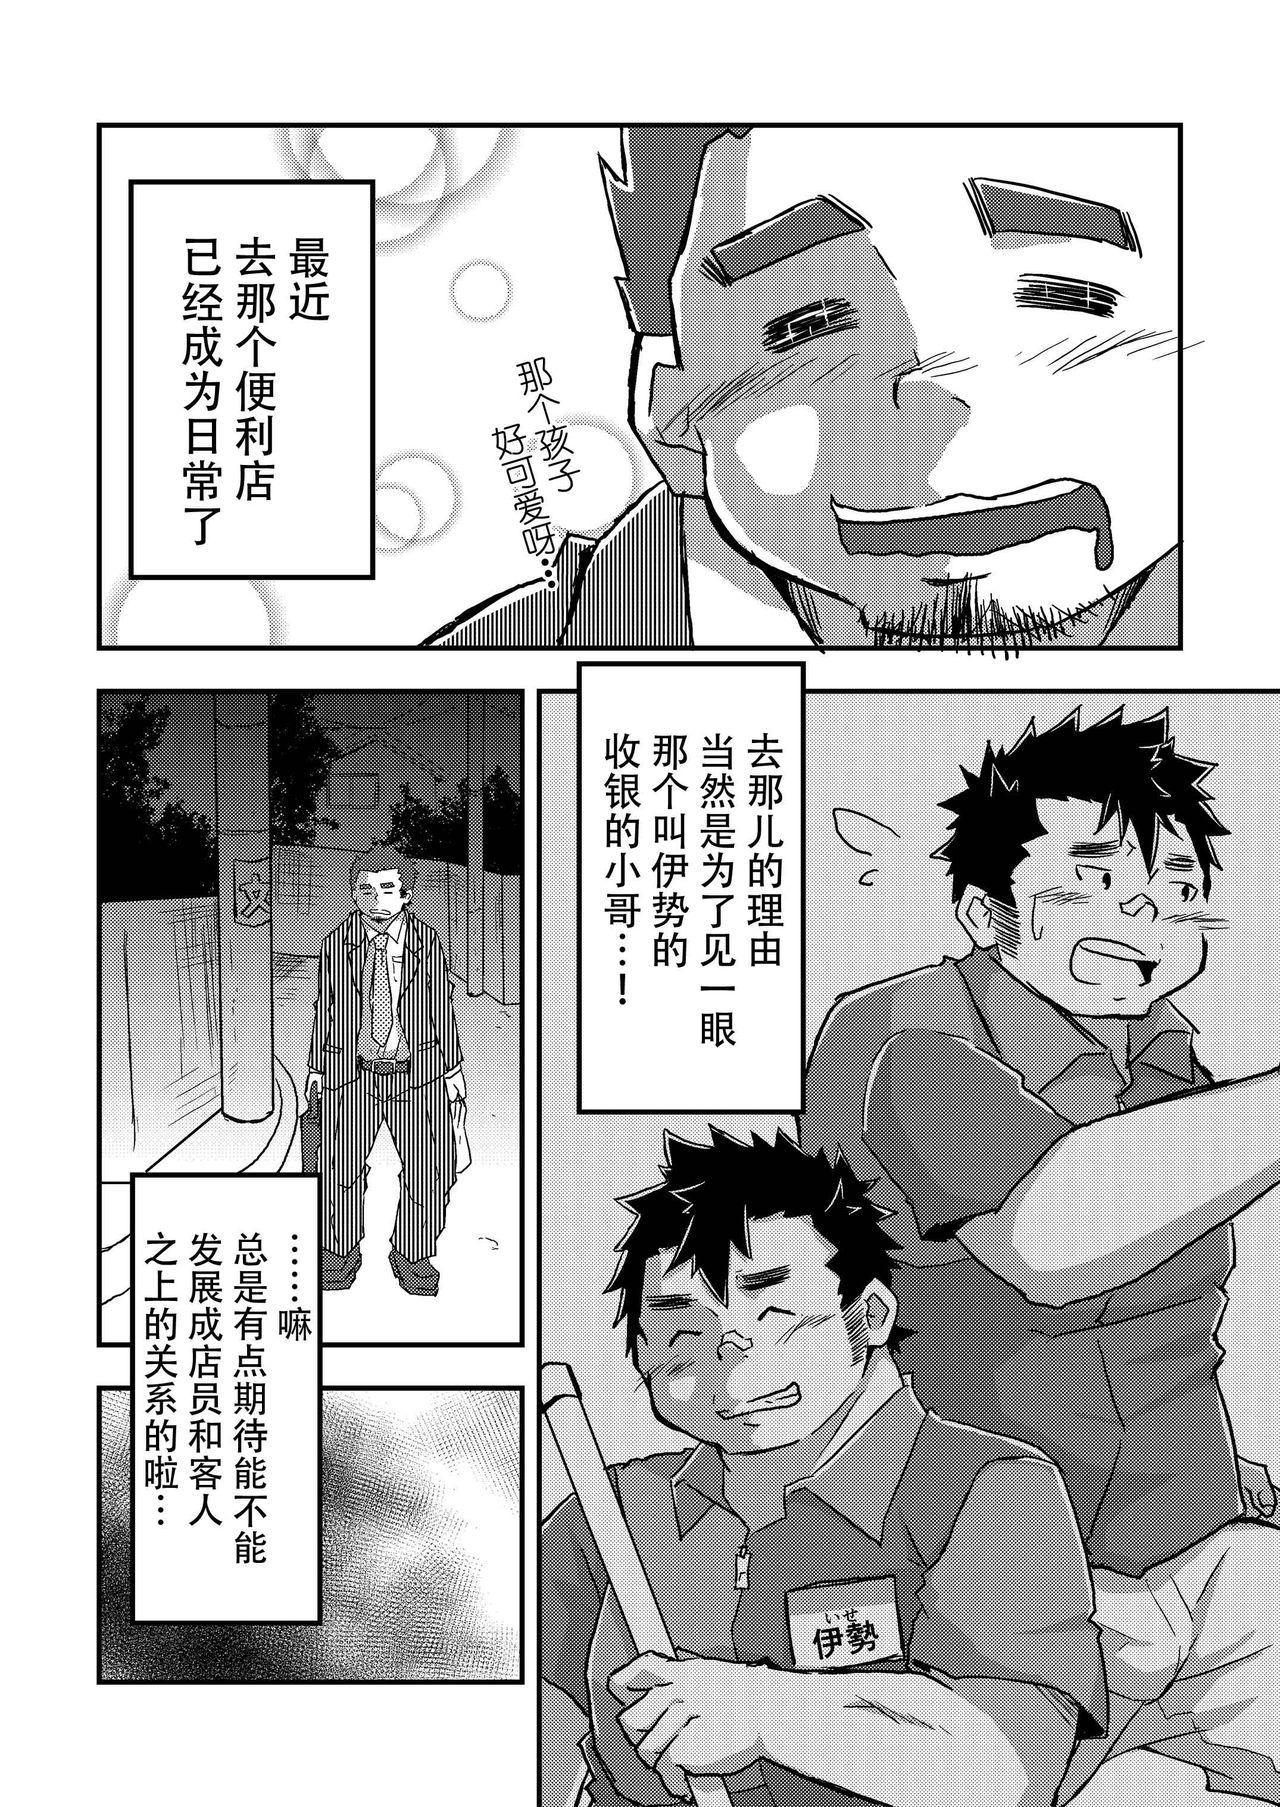 [CorkBOX (ngng)] Ise-kun wa Tamatte Iru. - Ise-kun is horny. [Chinese] {日曜日汉化} [Digital] 2